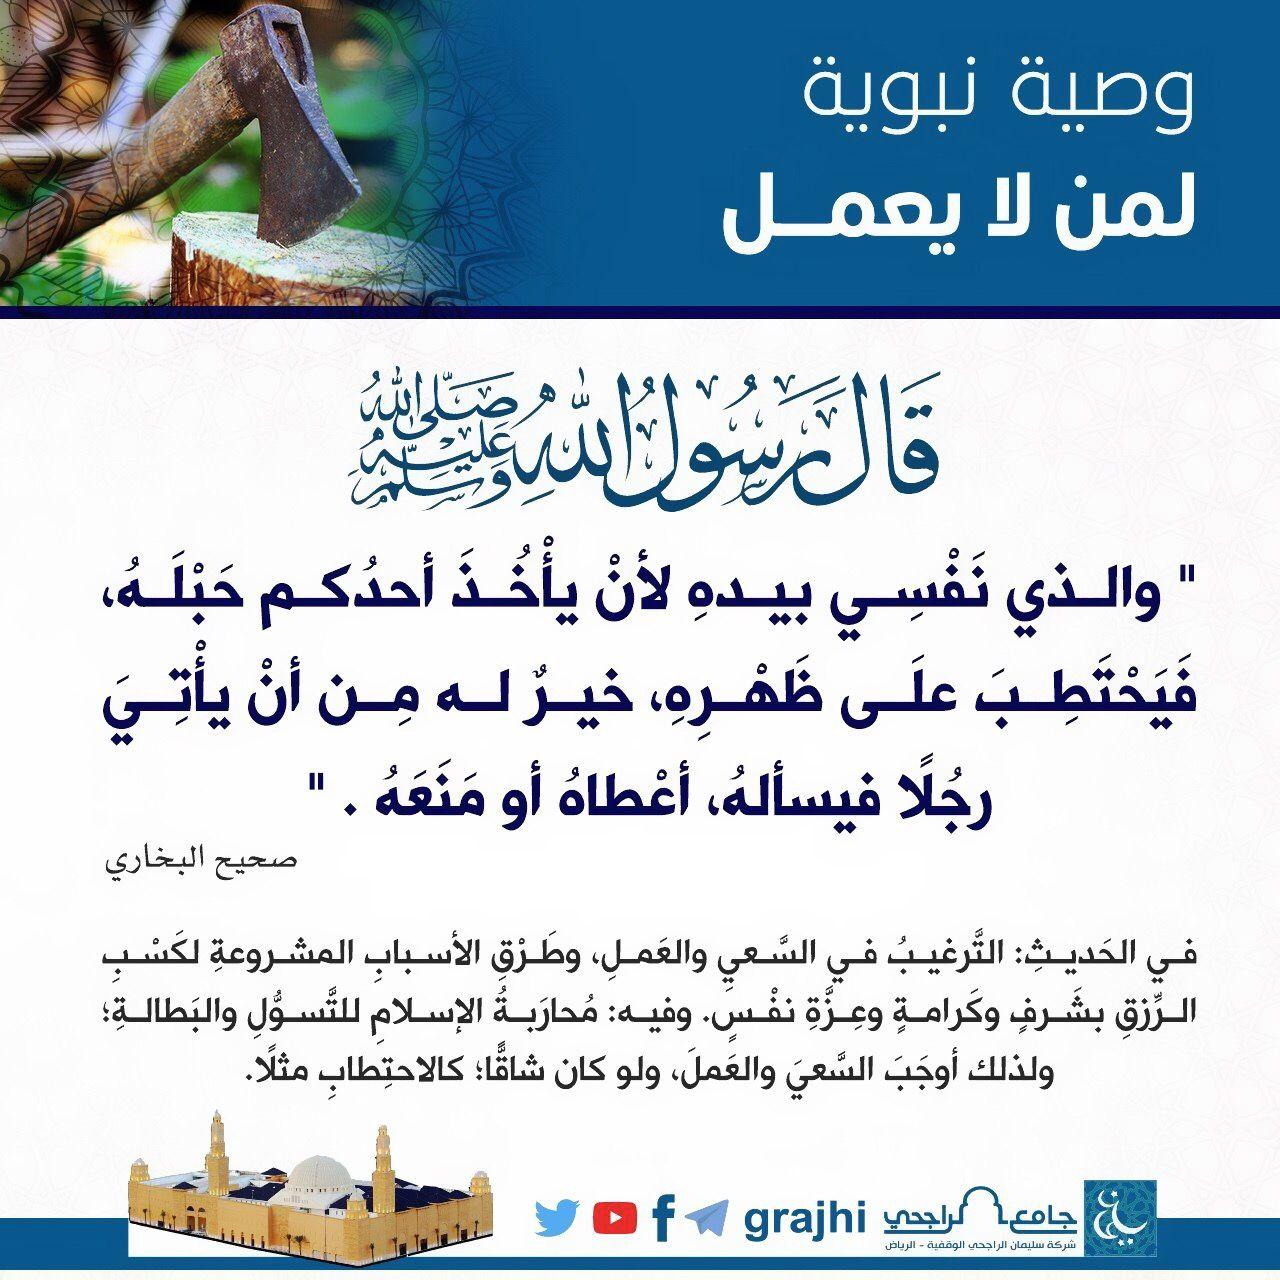 Pin By نشر الخير On أحاديث سيدنا محمد صلى الله عليه وسلم Hadith Islam